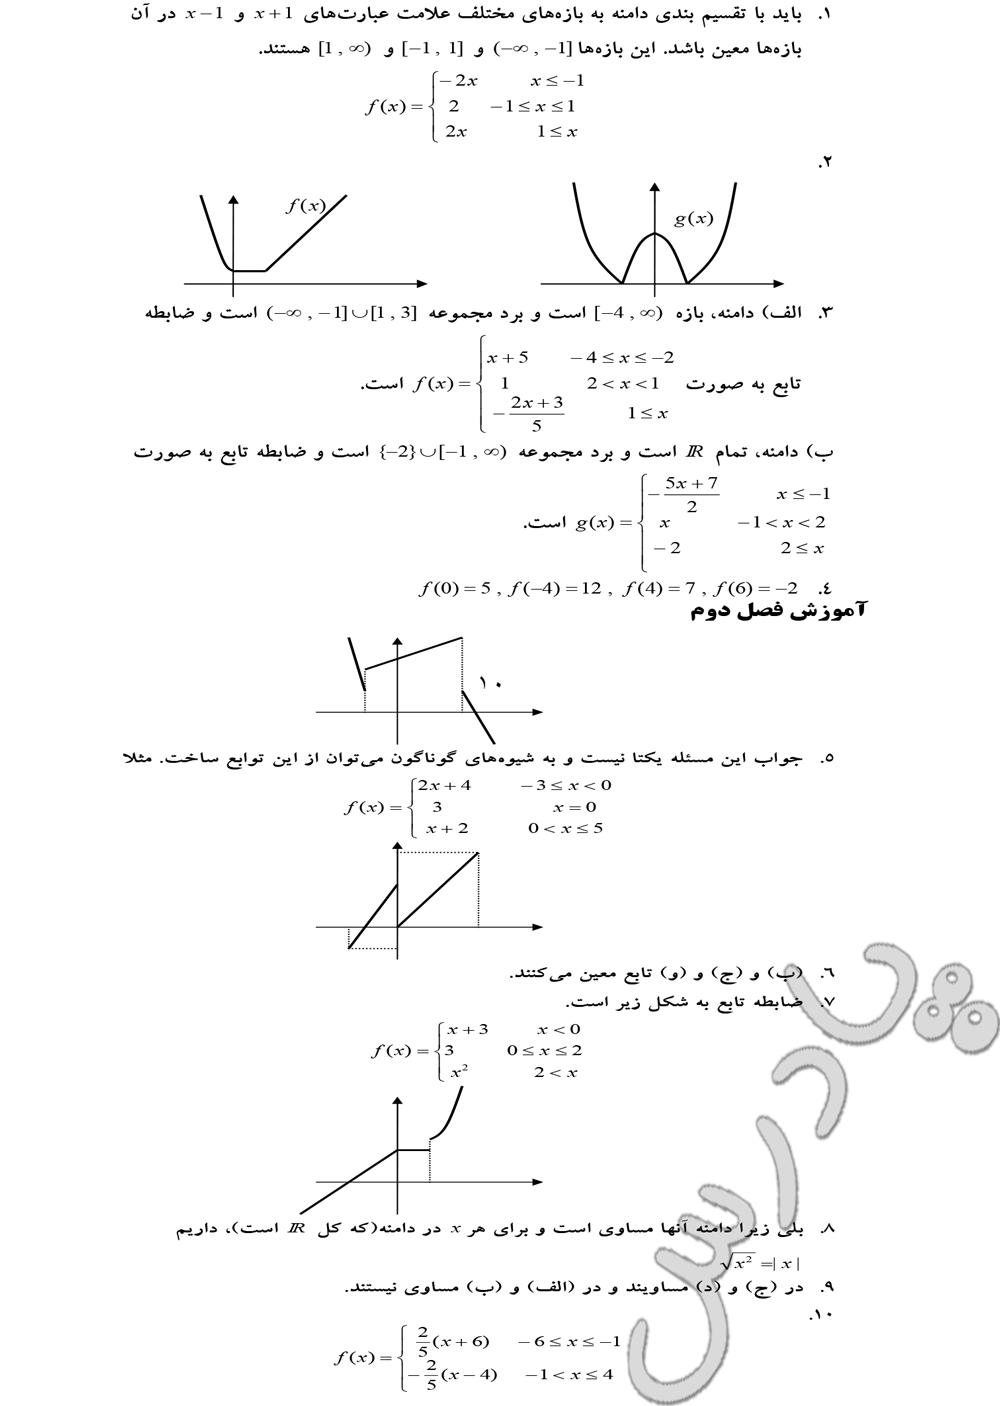 حل مسائل صفحه 52 حسابان